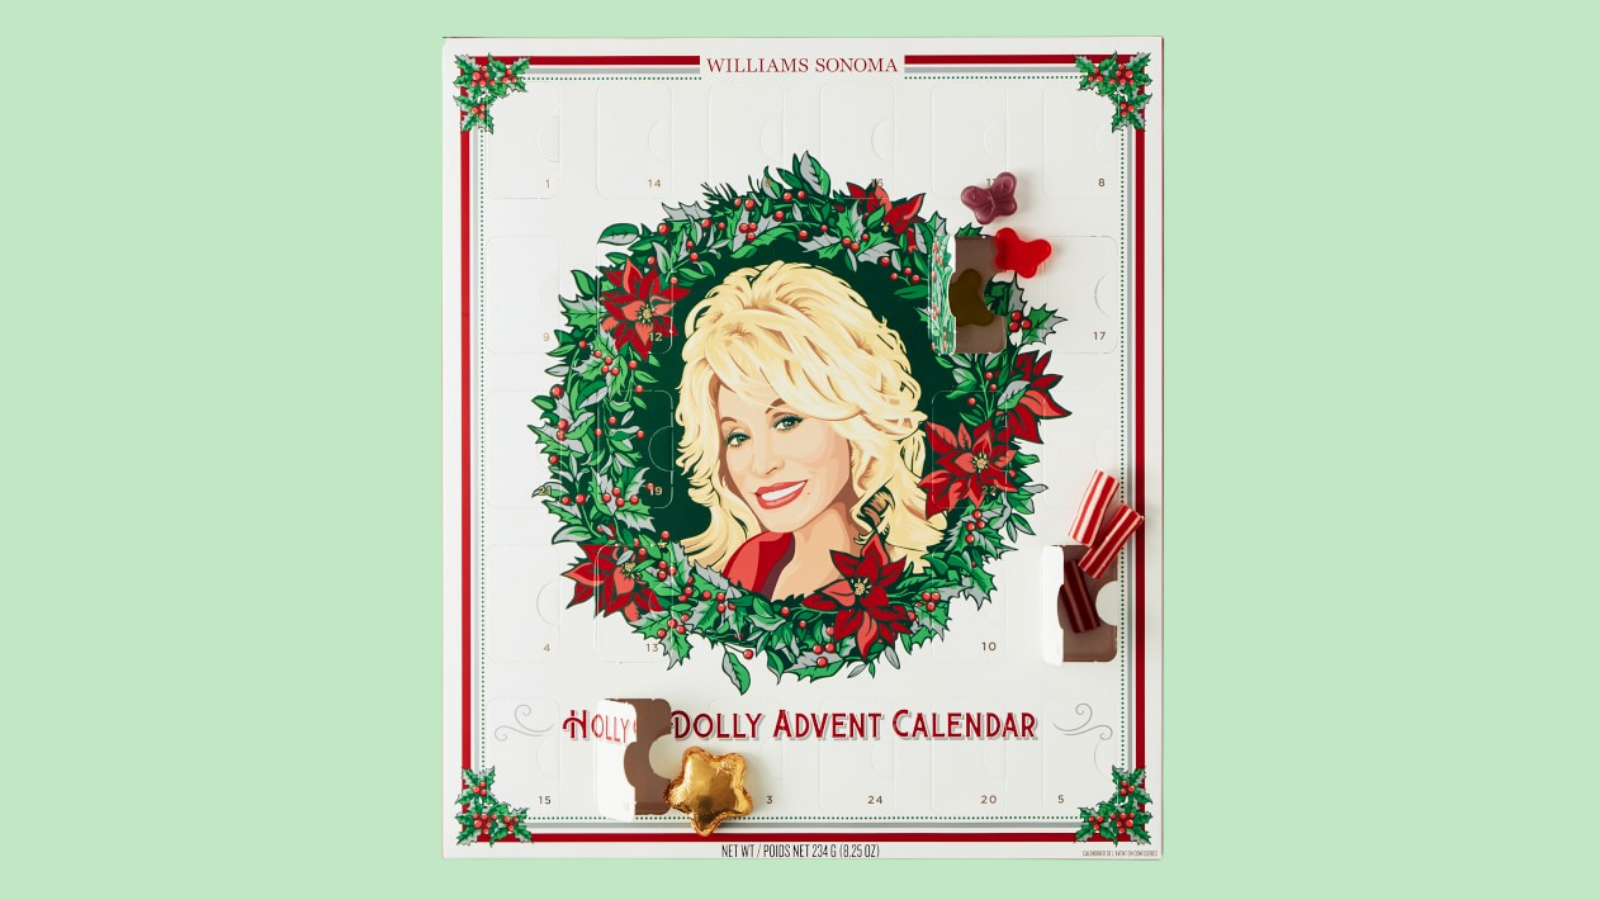 An advent calendar features a photo of Dolly Parton's face inside a wreath.